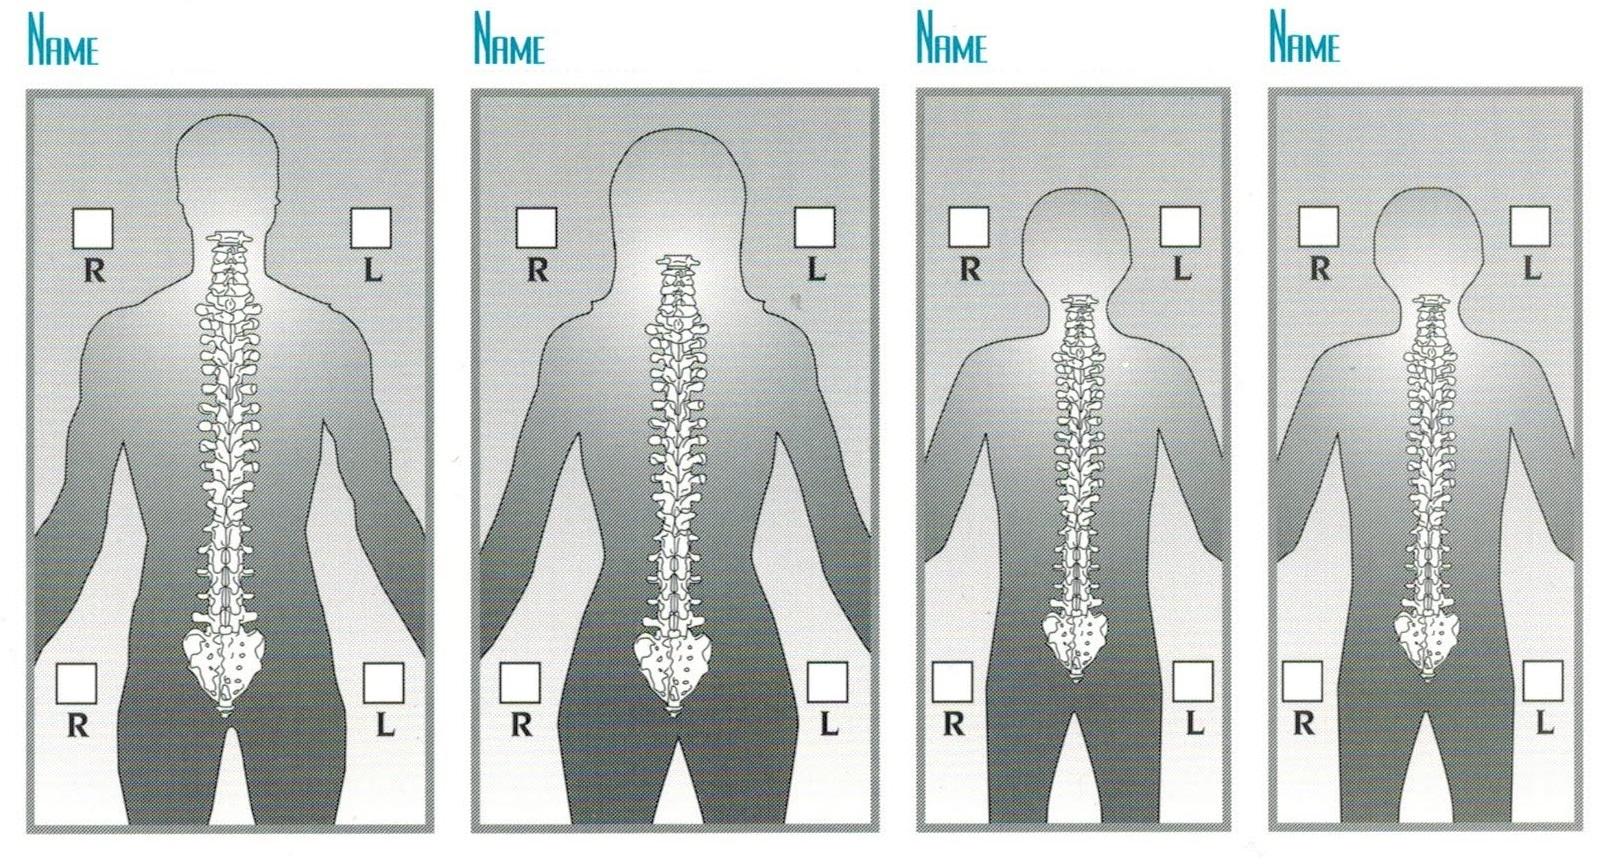 scoliosis posture chart